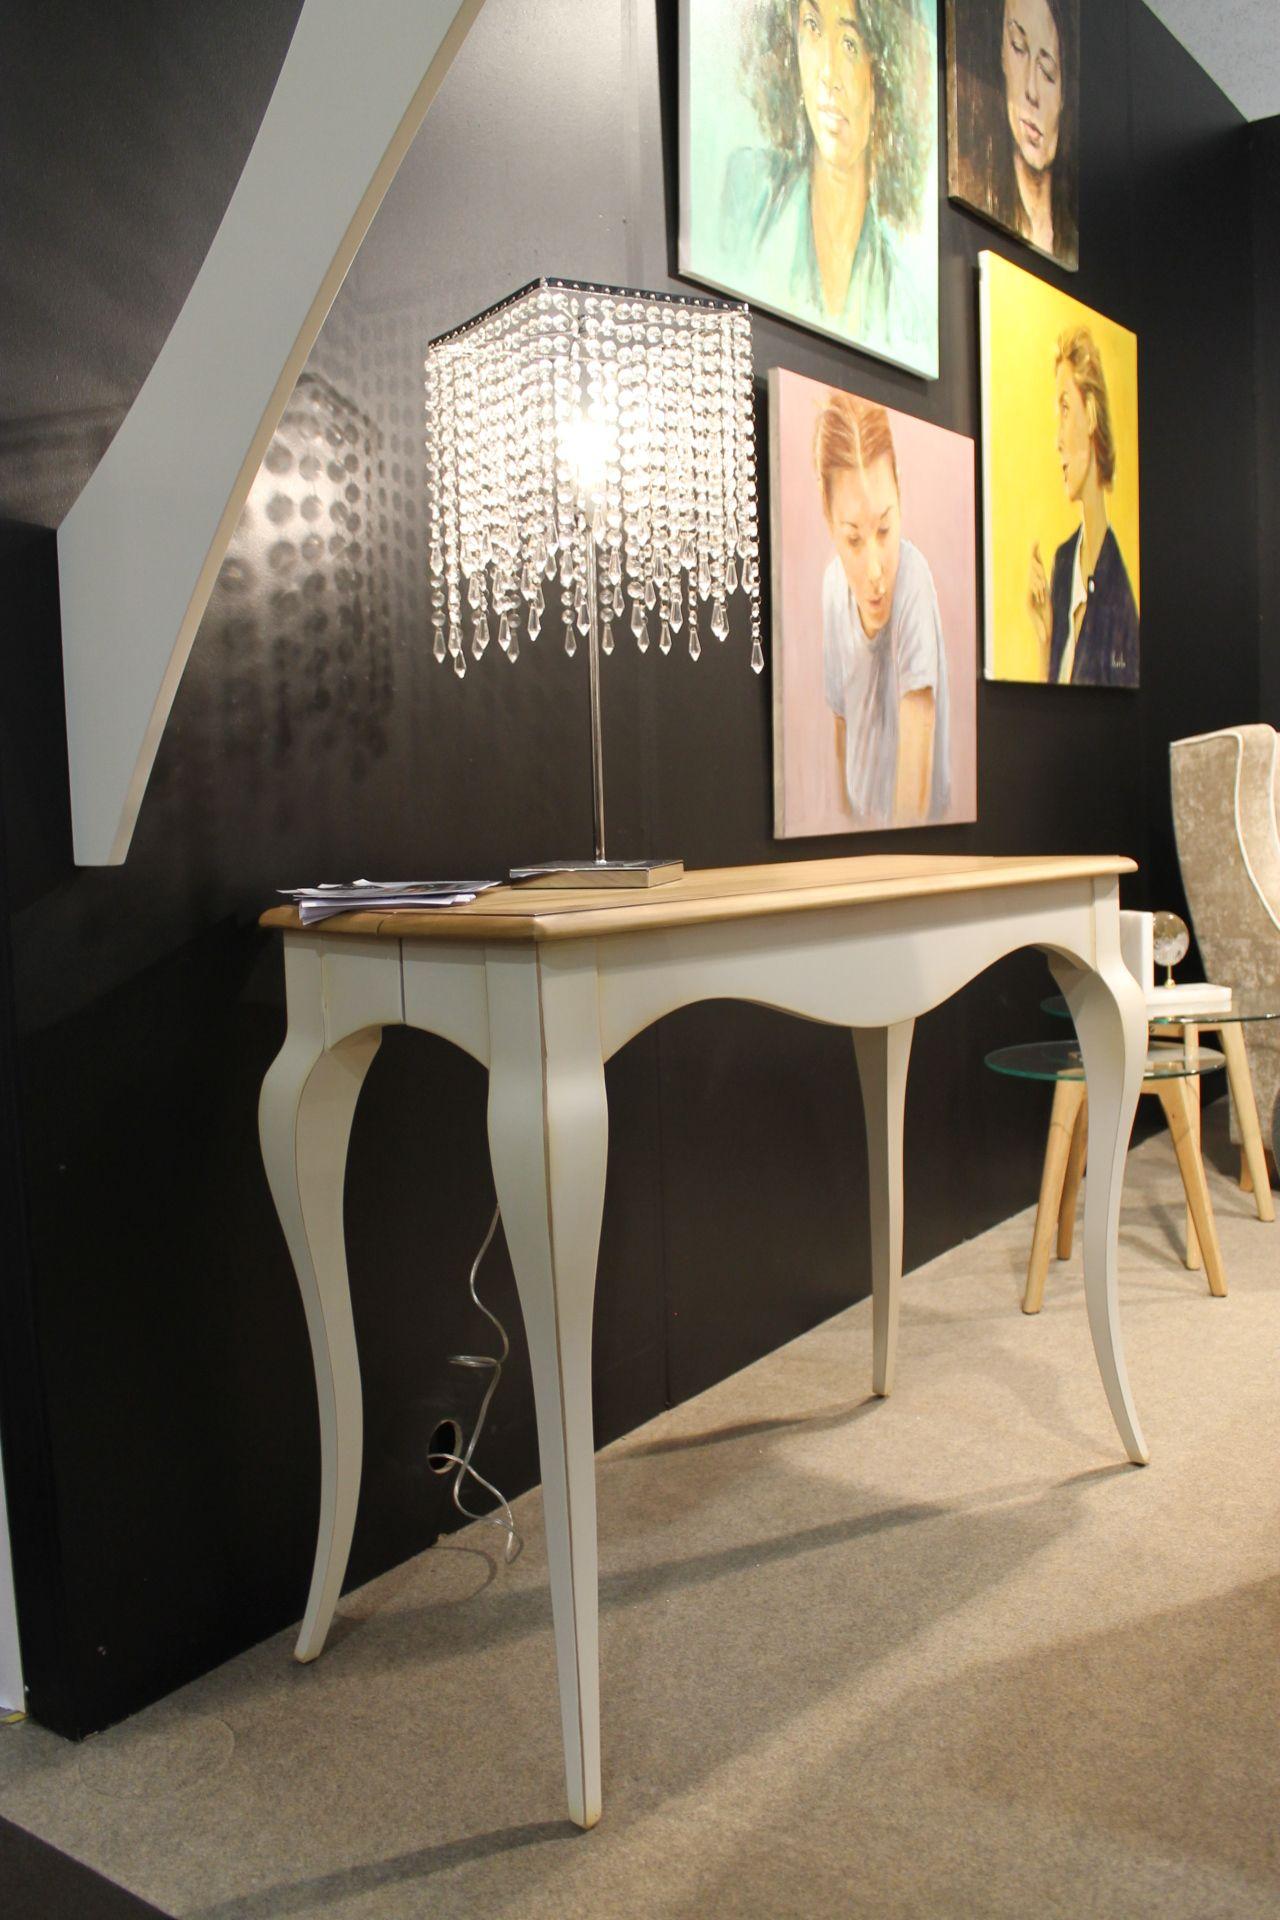 Muebles Rupema Icono Interiorismo En La Feria Del Mueble N Jera  # Muebles Rupema Najera